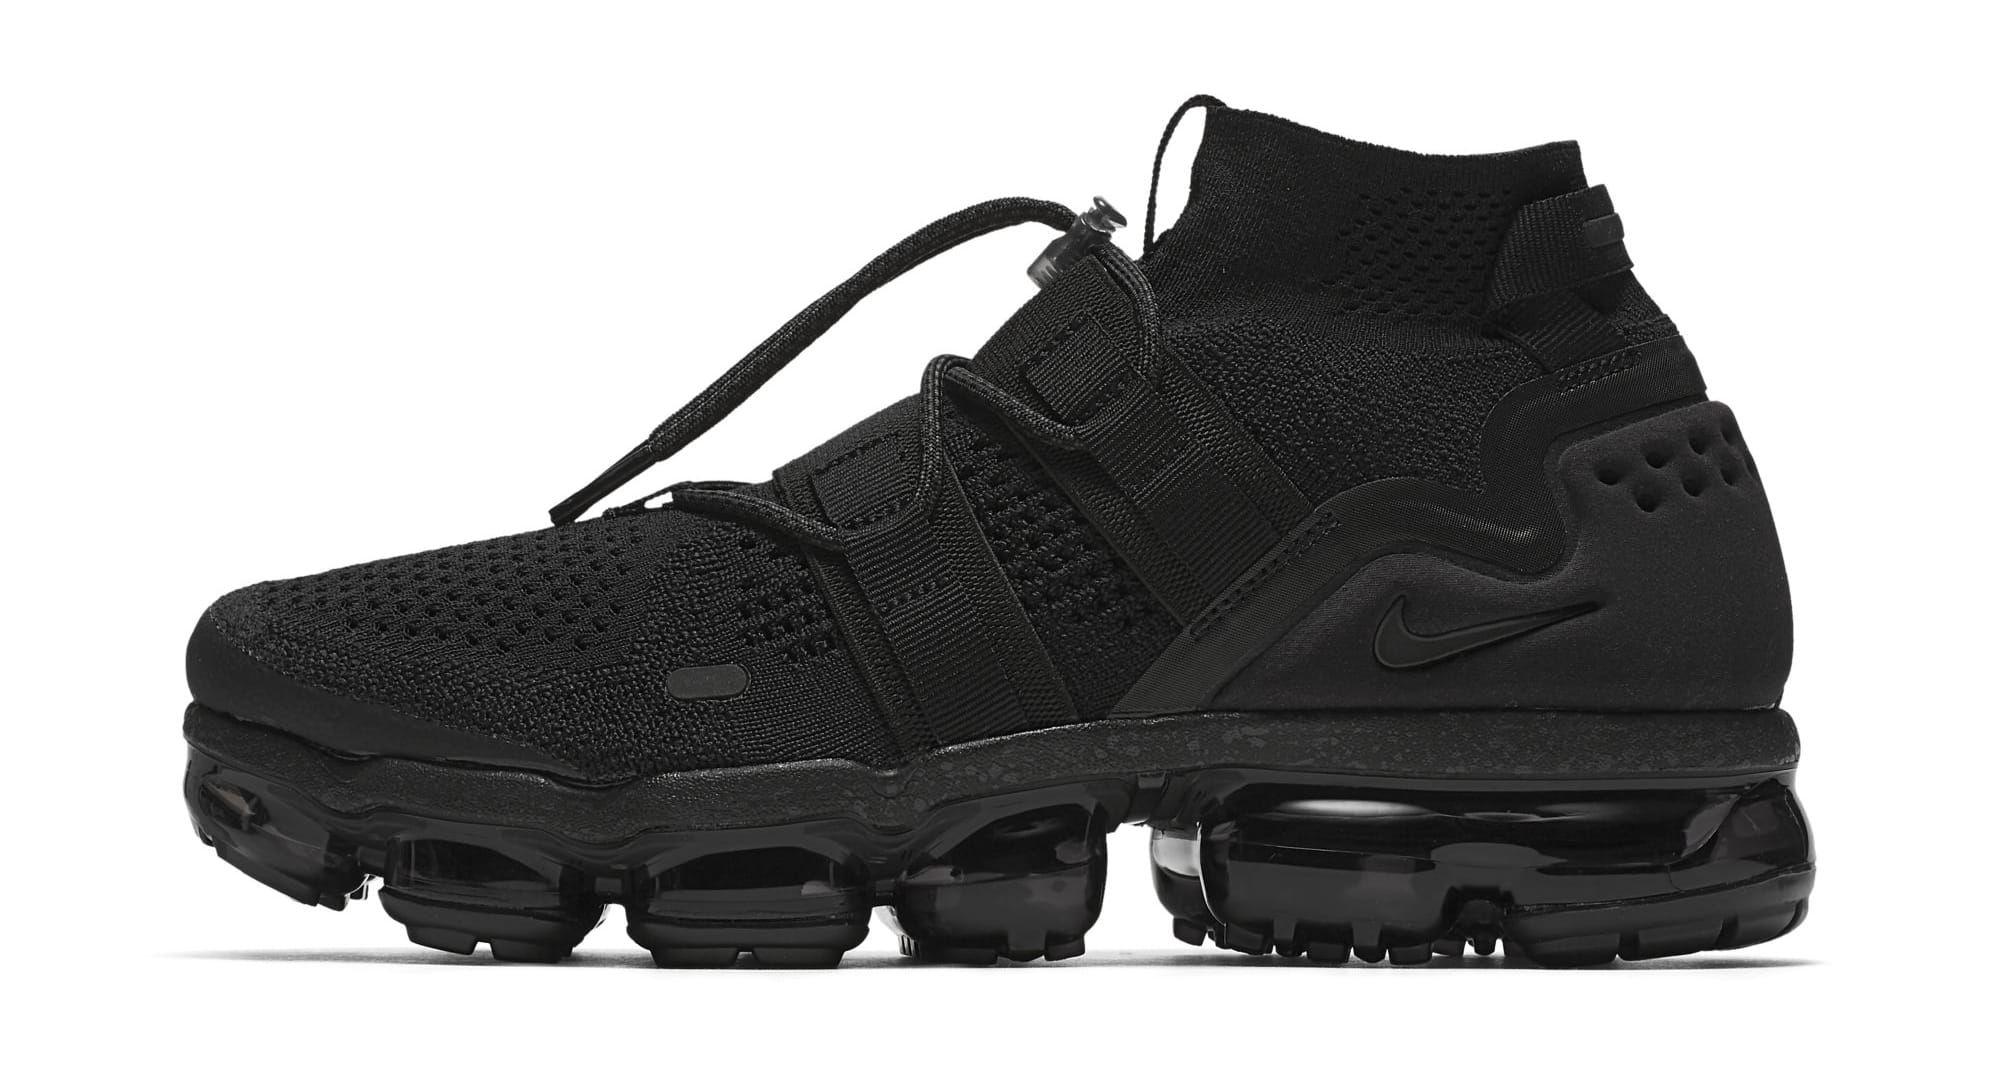 0ac480d7da633 Nike Air VaporMax Flyknit Utility Profile | Sneakers | Nike air ...